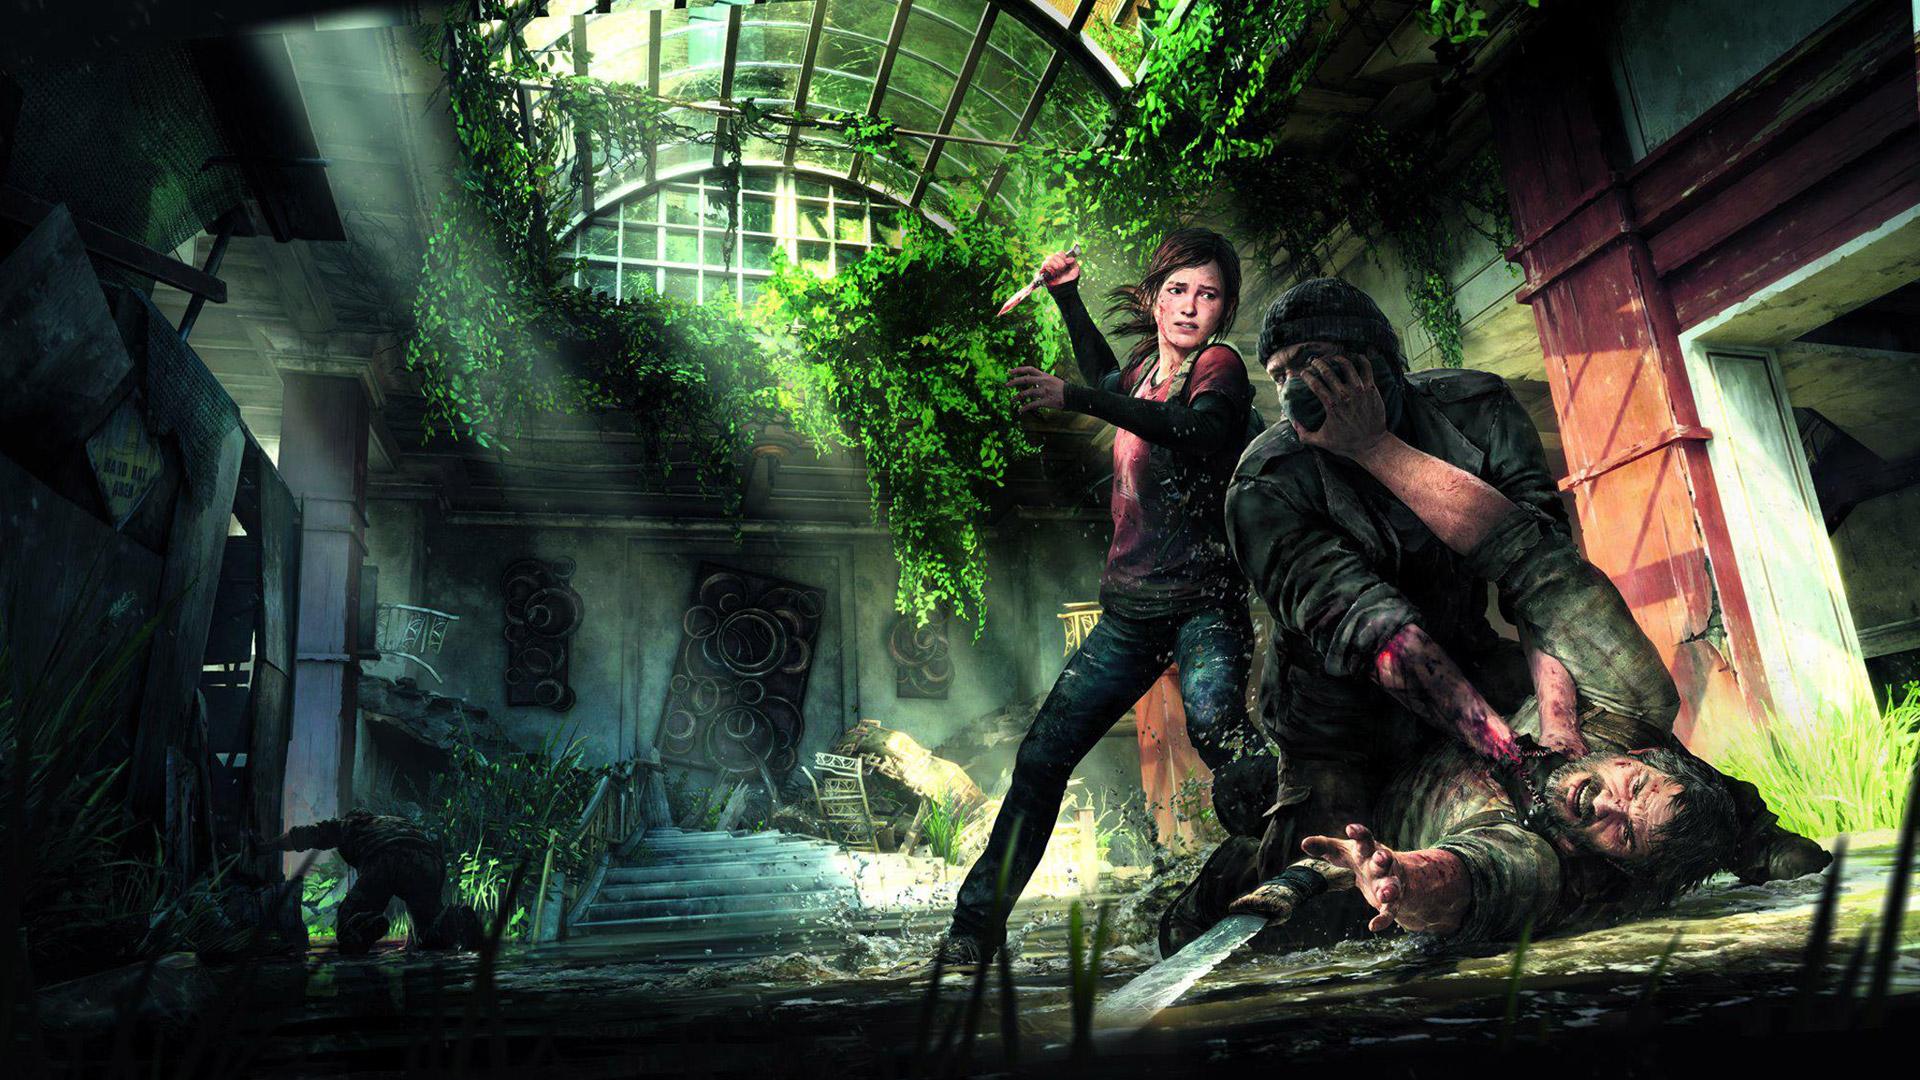 The Last of Us wallpaper 32 | WallpapersBQ